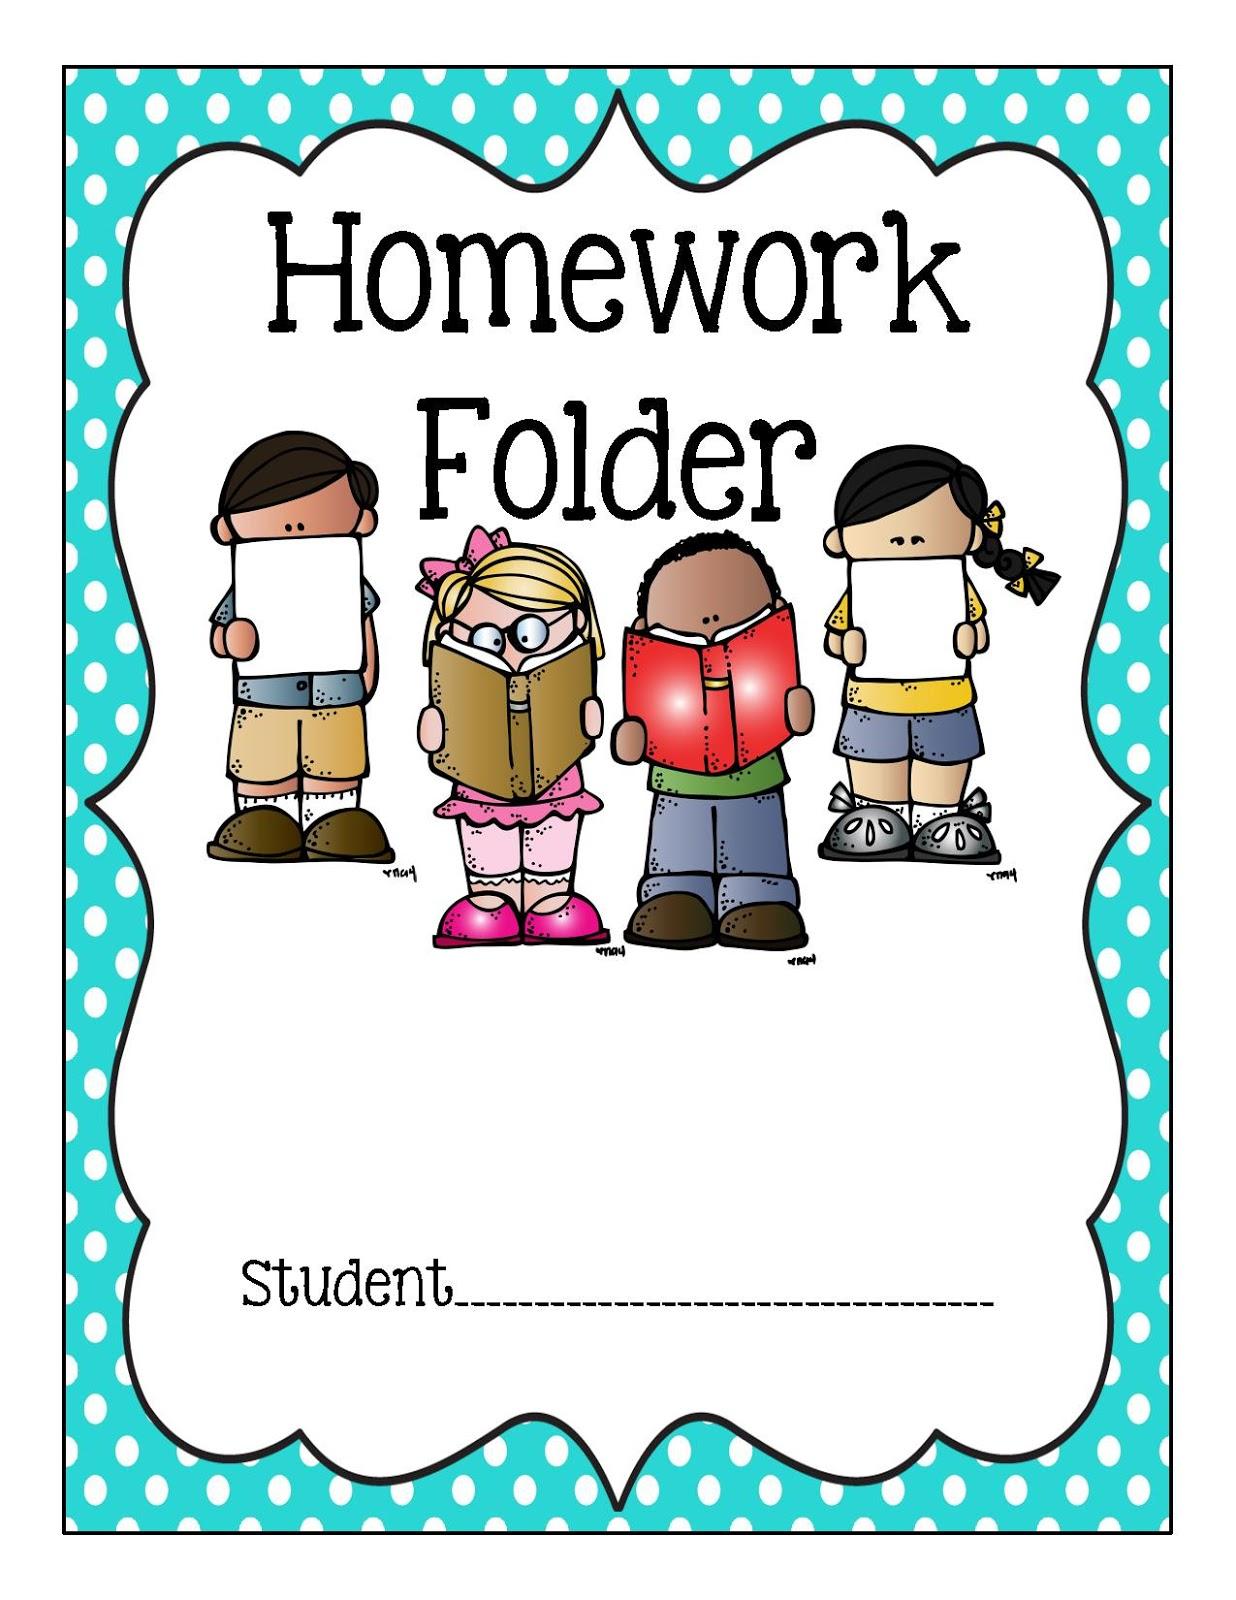 Binder Clipart Homework Binder Homework Transparent Free